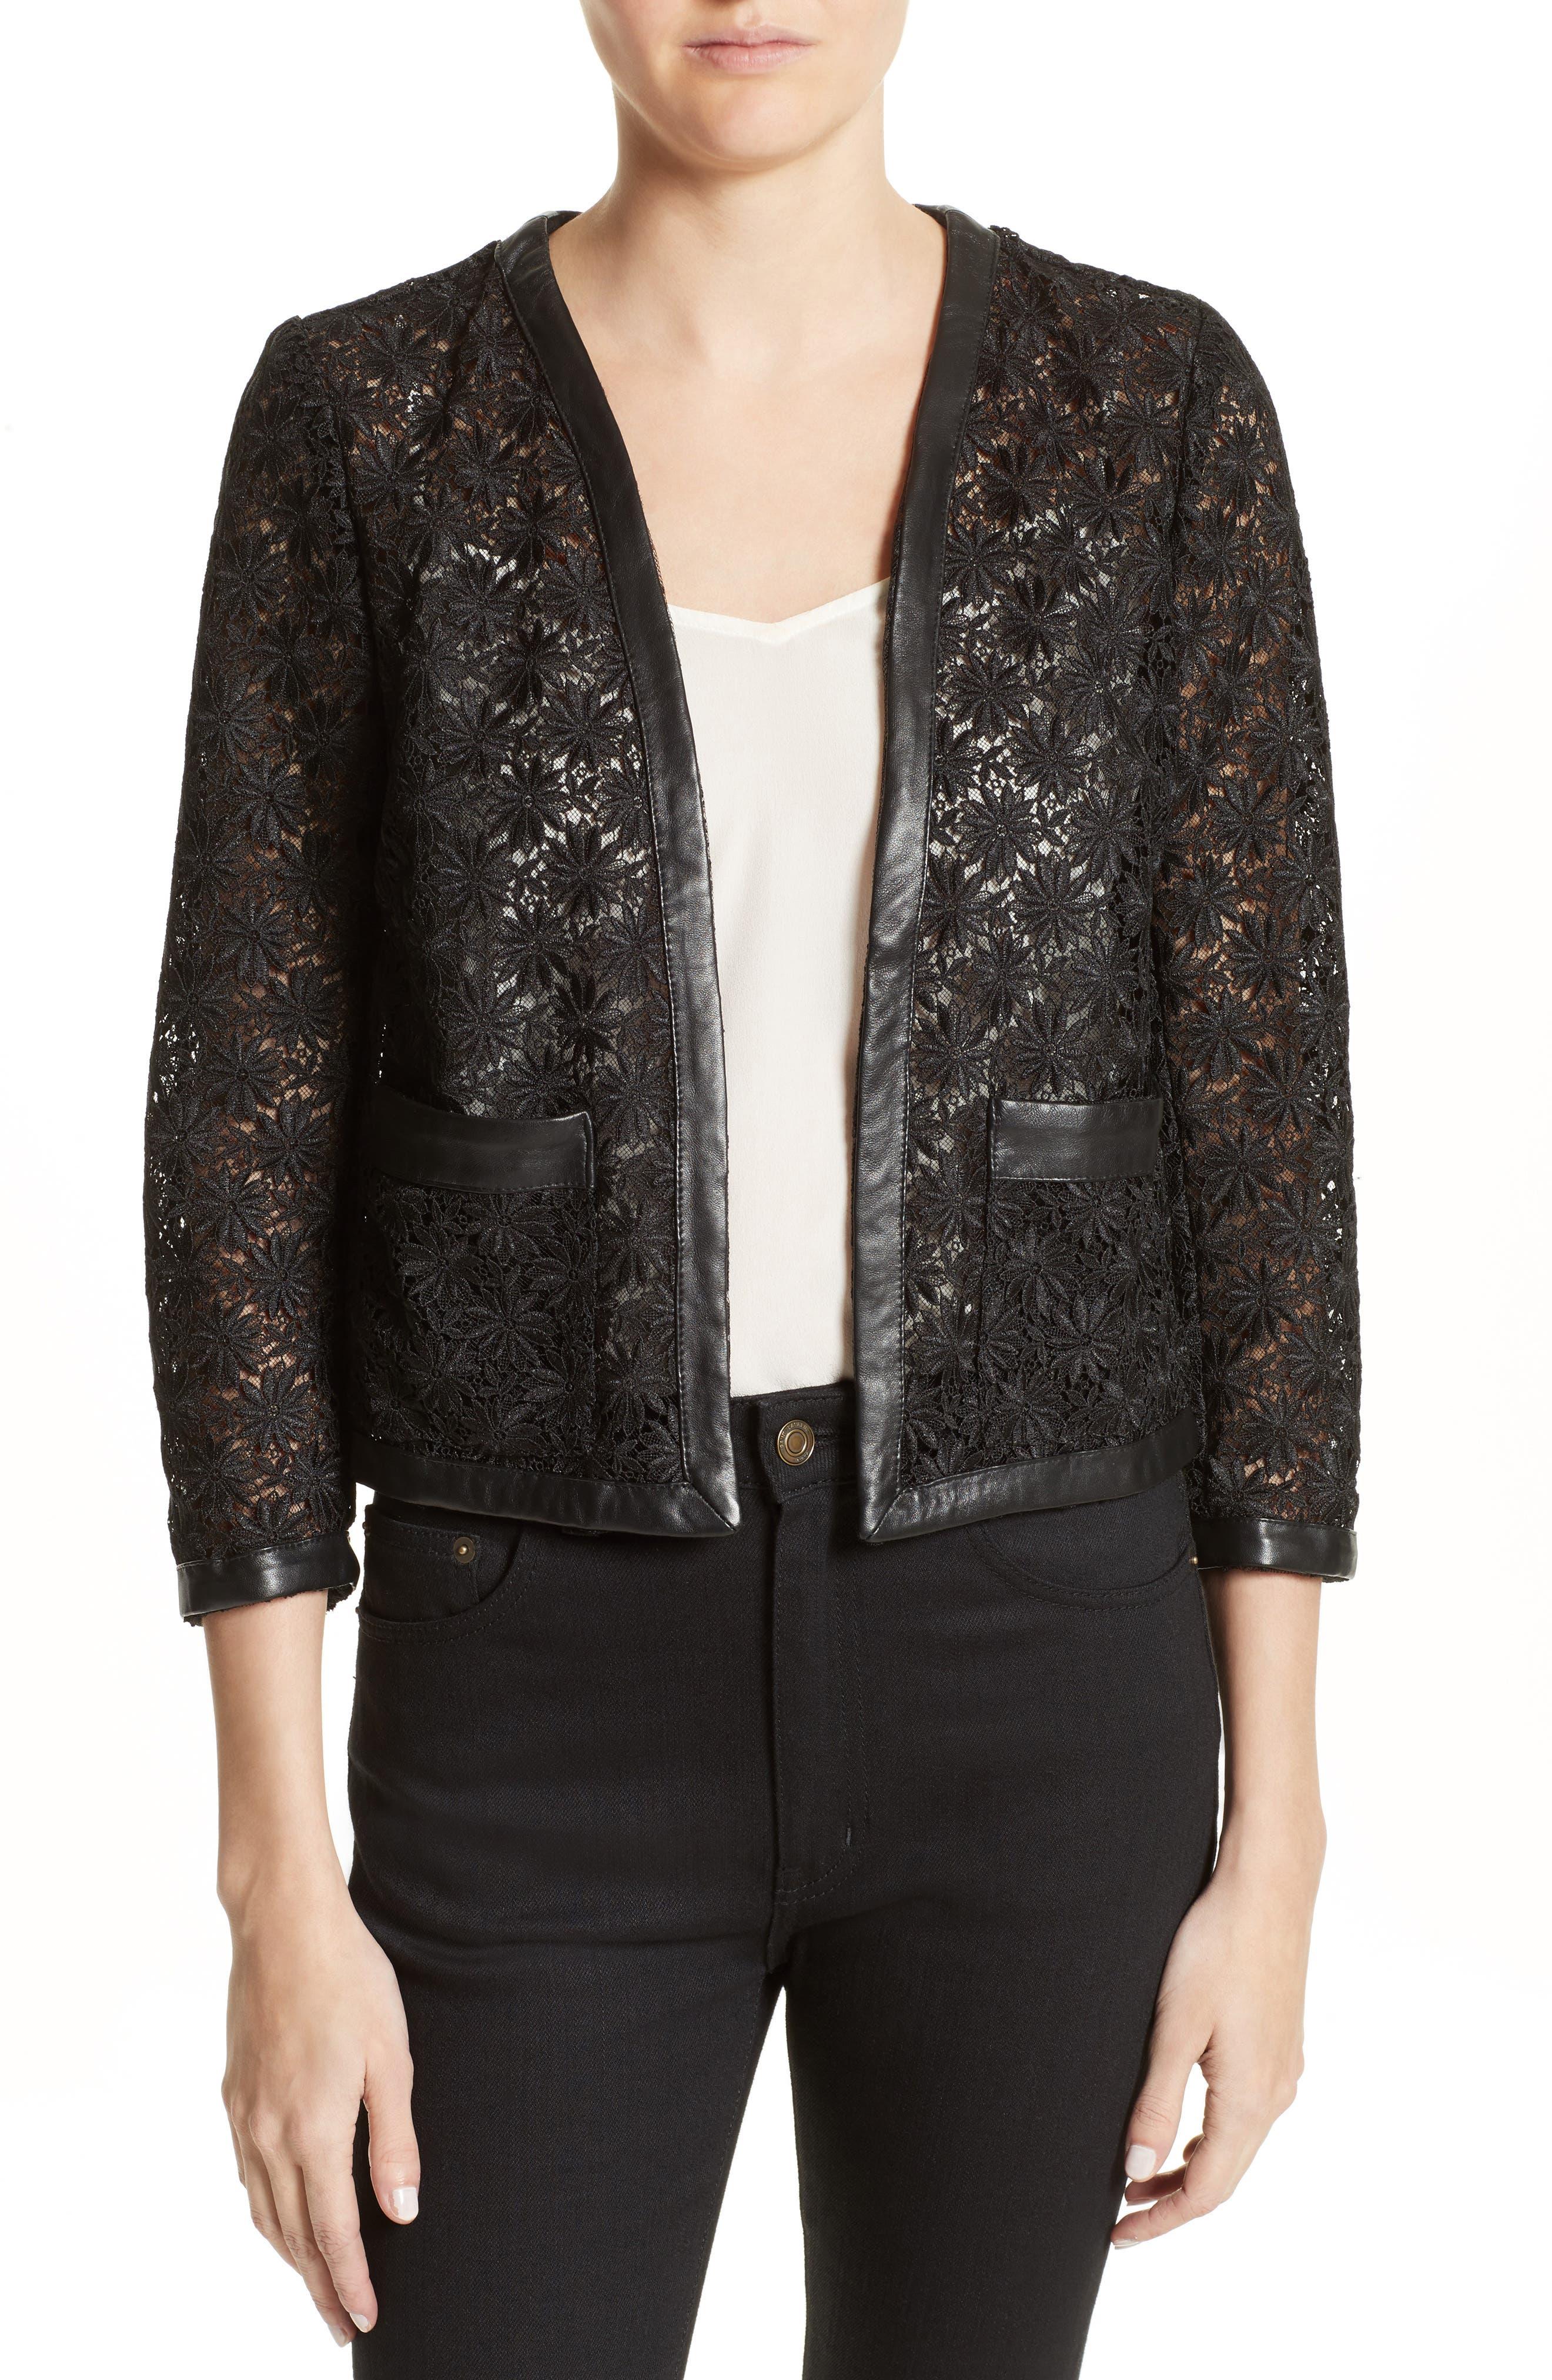 Main Image - The Kooples Faux Leather Trim Lace Jacket